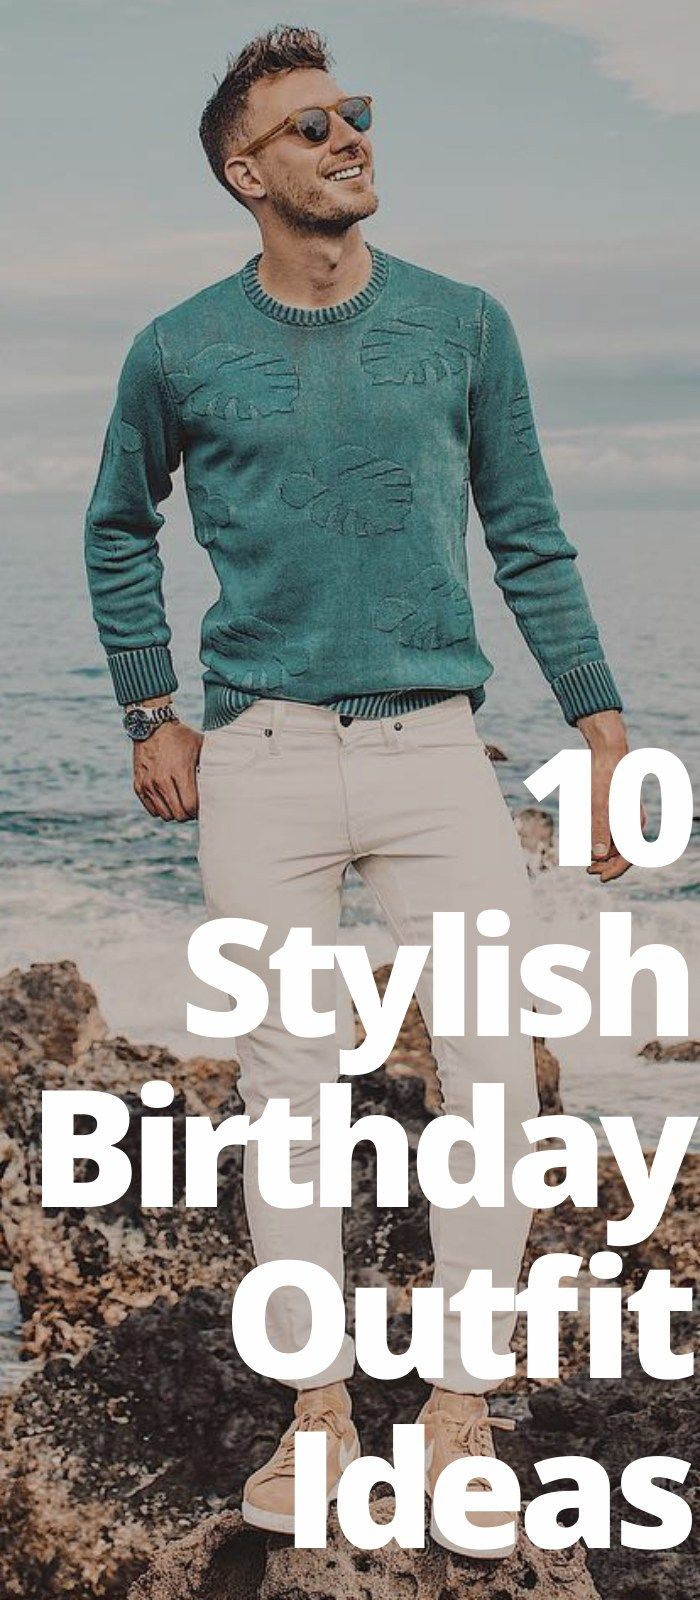 10 Stylish Birthday Outfit Ideas Mens Fashion Magazine Blog Tips